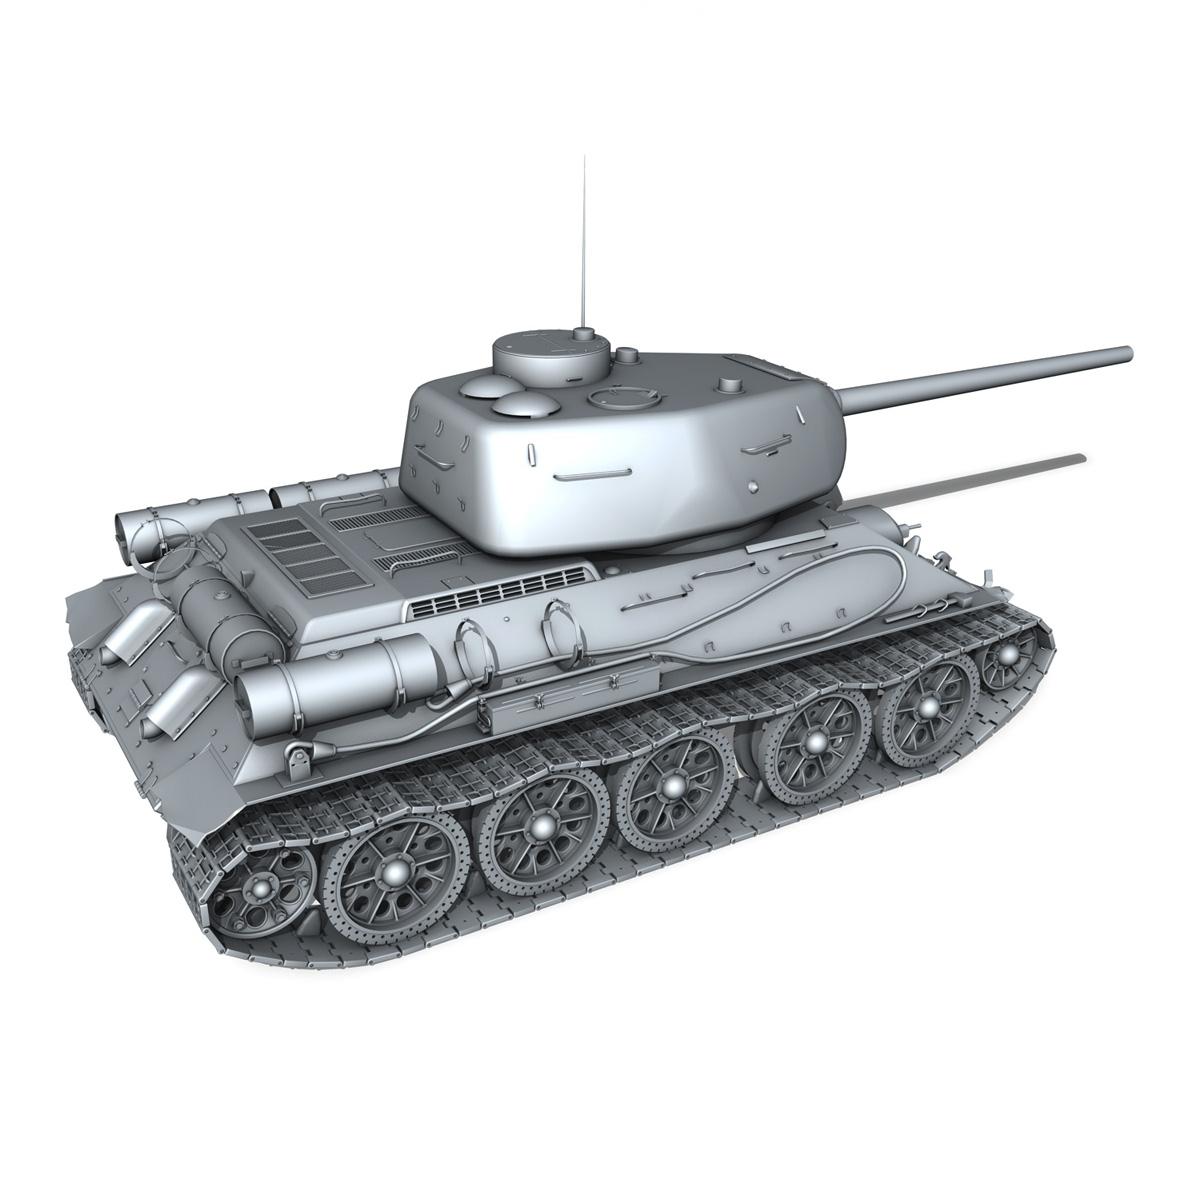 t-34 85 – soviet medium tank 3d model 3ds fbx lwo lw lws obj c4d 266413